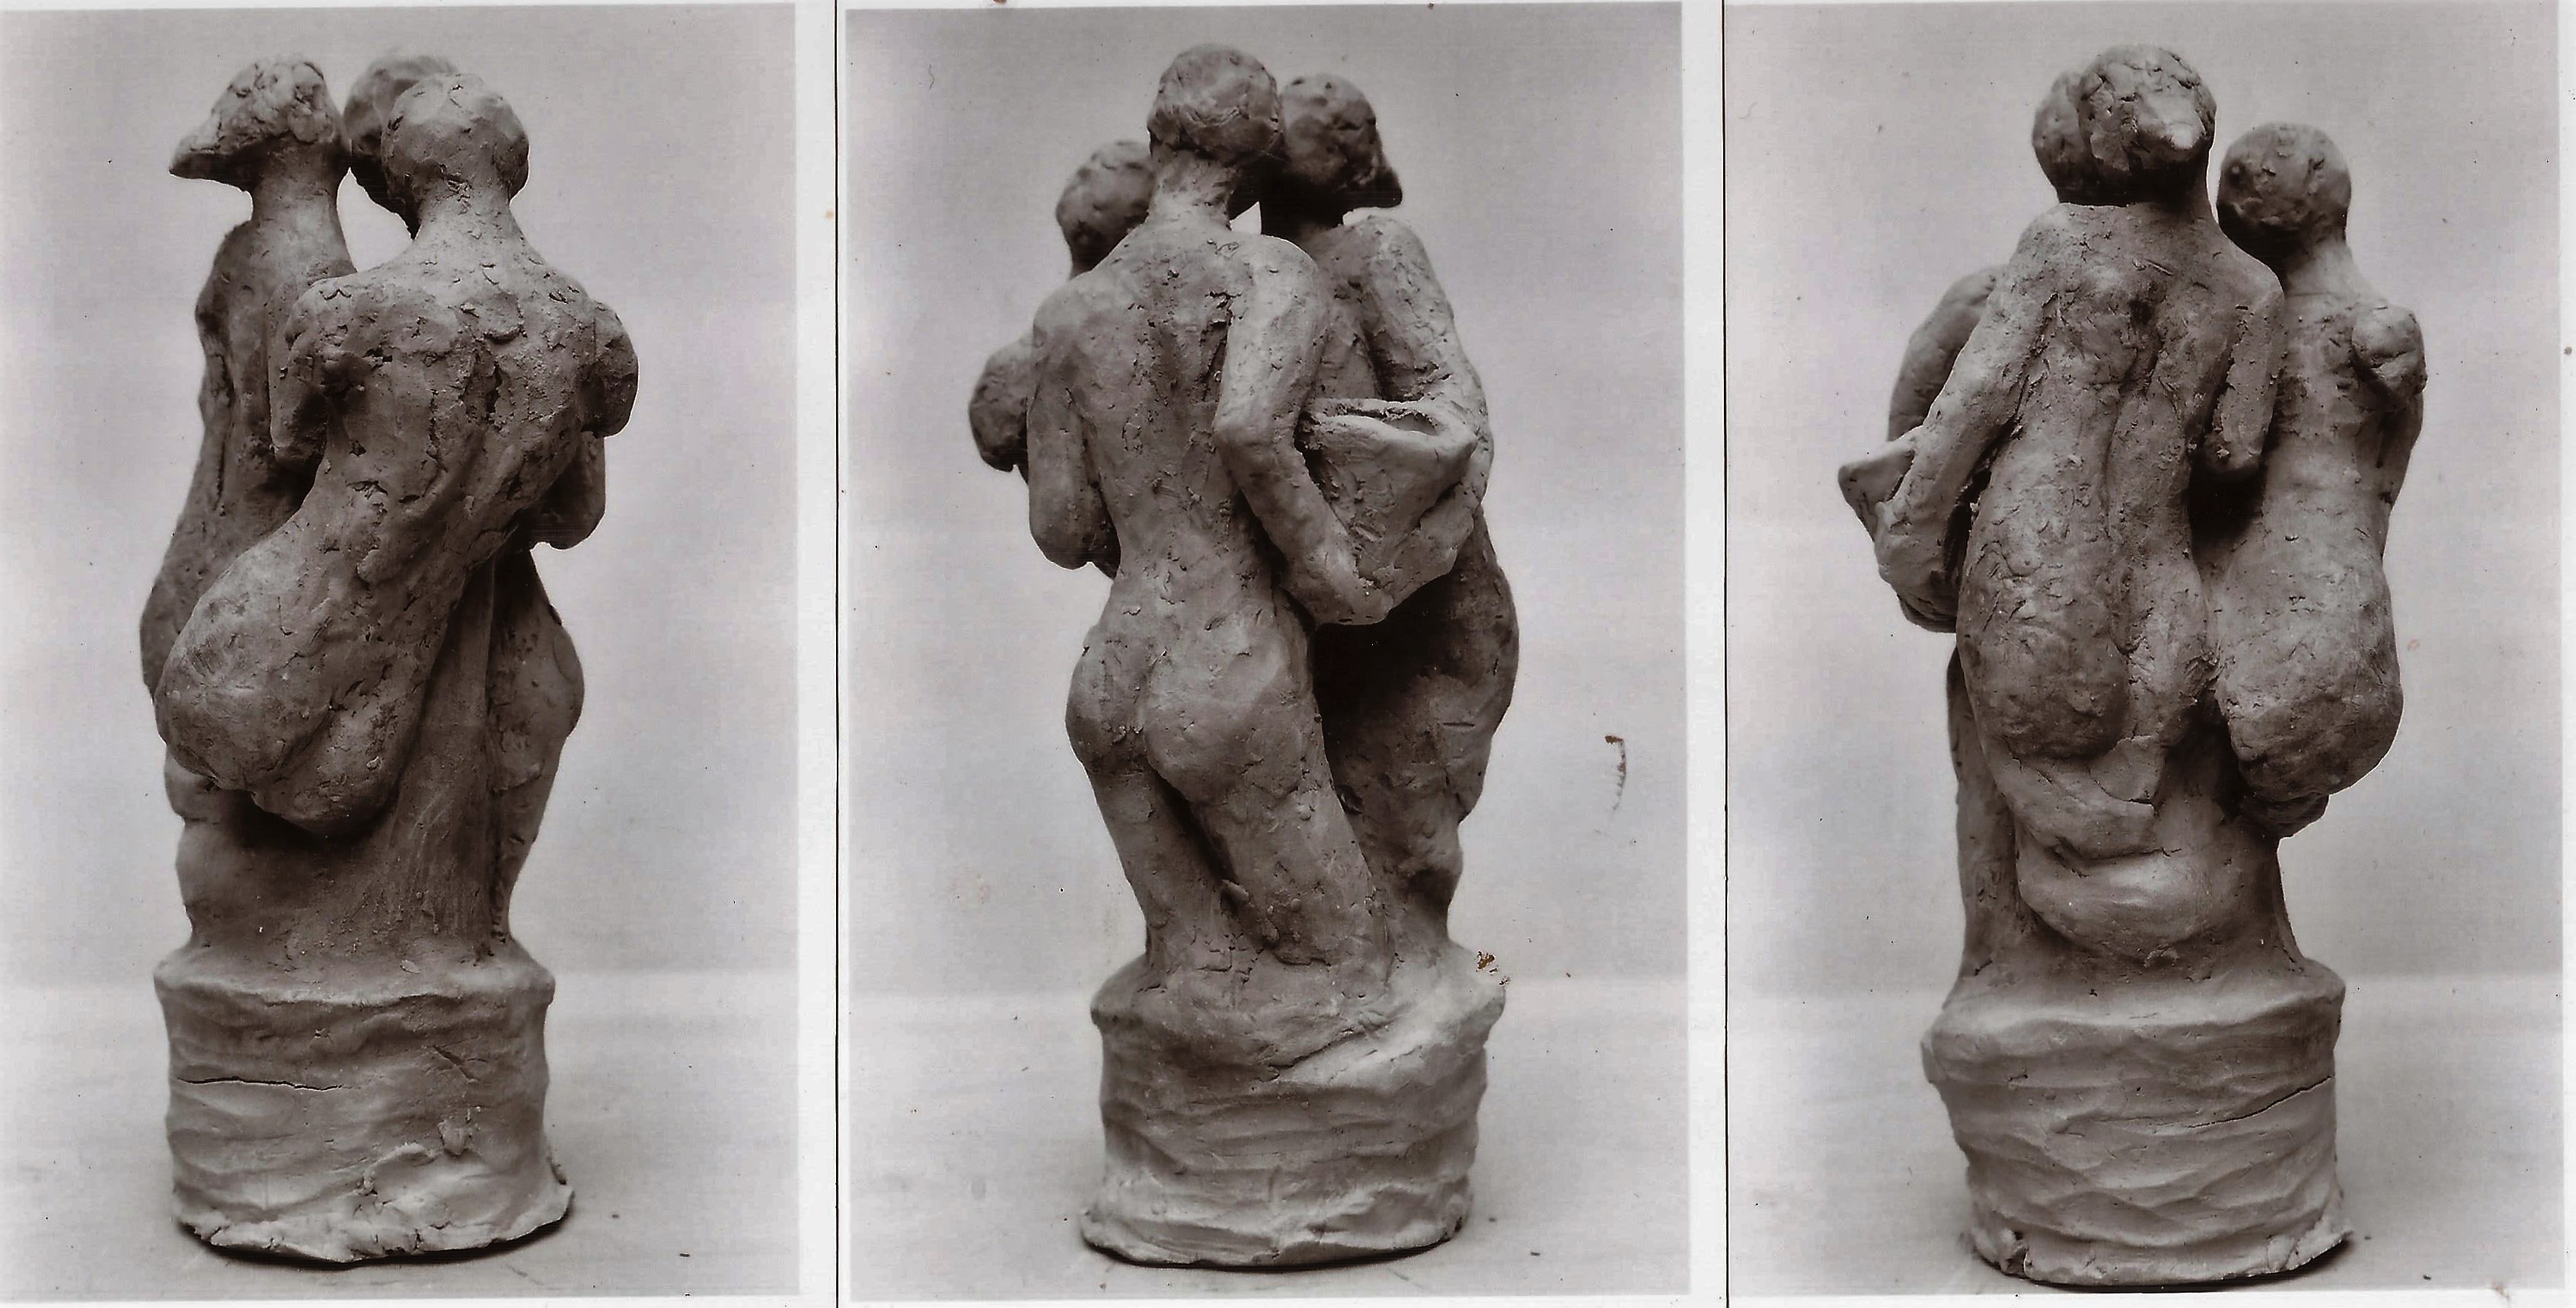 34.12 Trilogia (30hx20x20 cm)